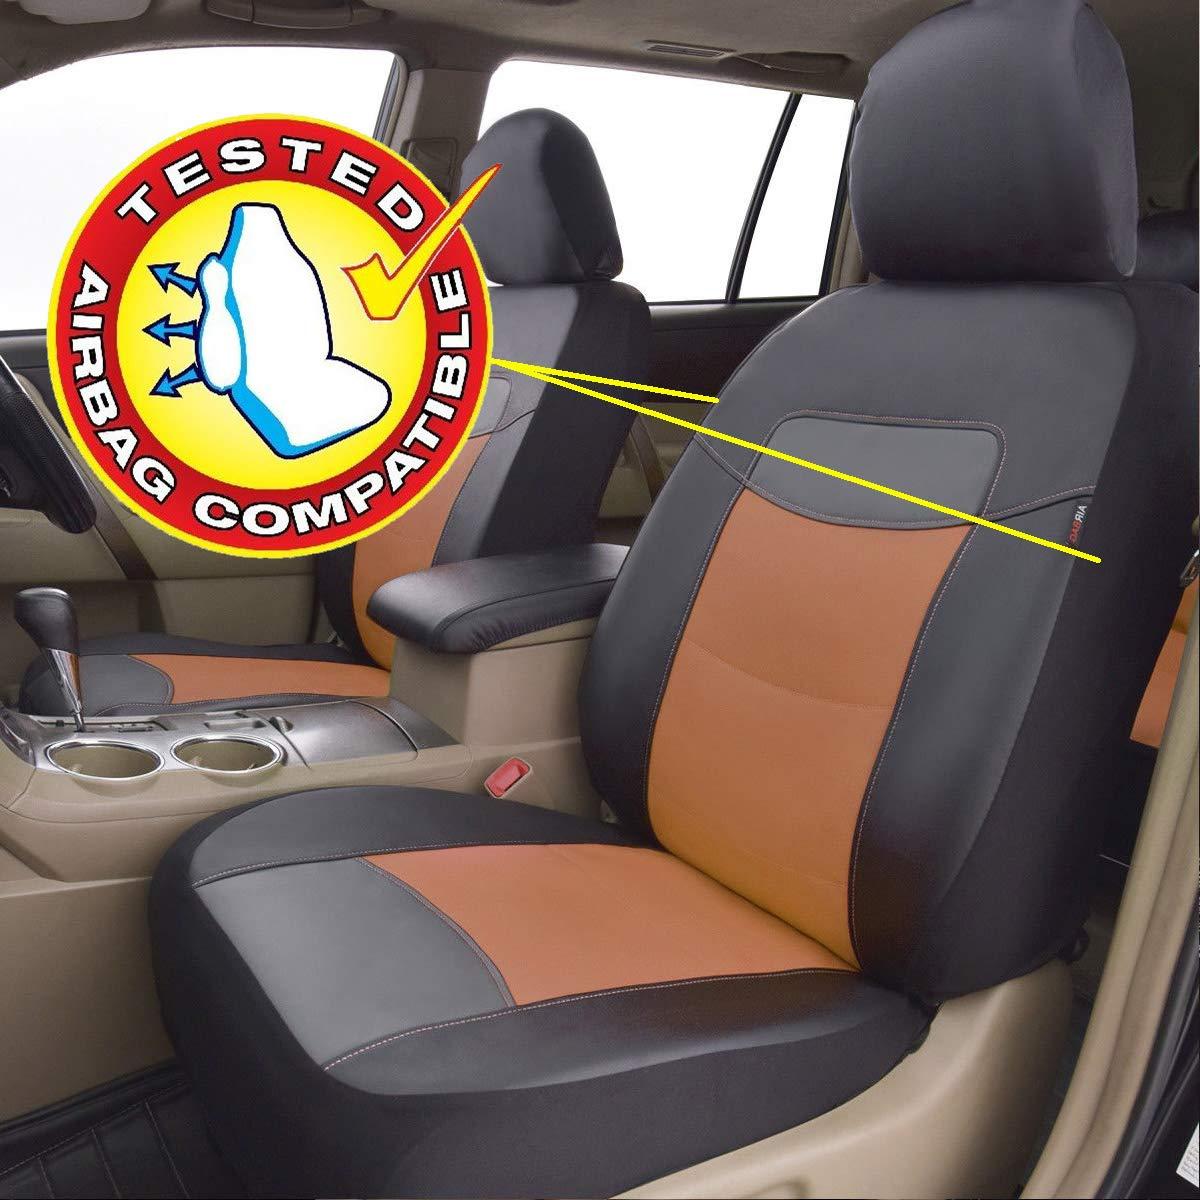 Flying Banner PU Cuir Housses de si/ège auto Design universel avec airbags lat/éraux